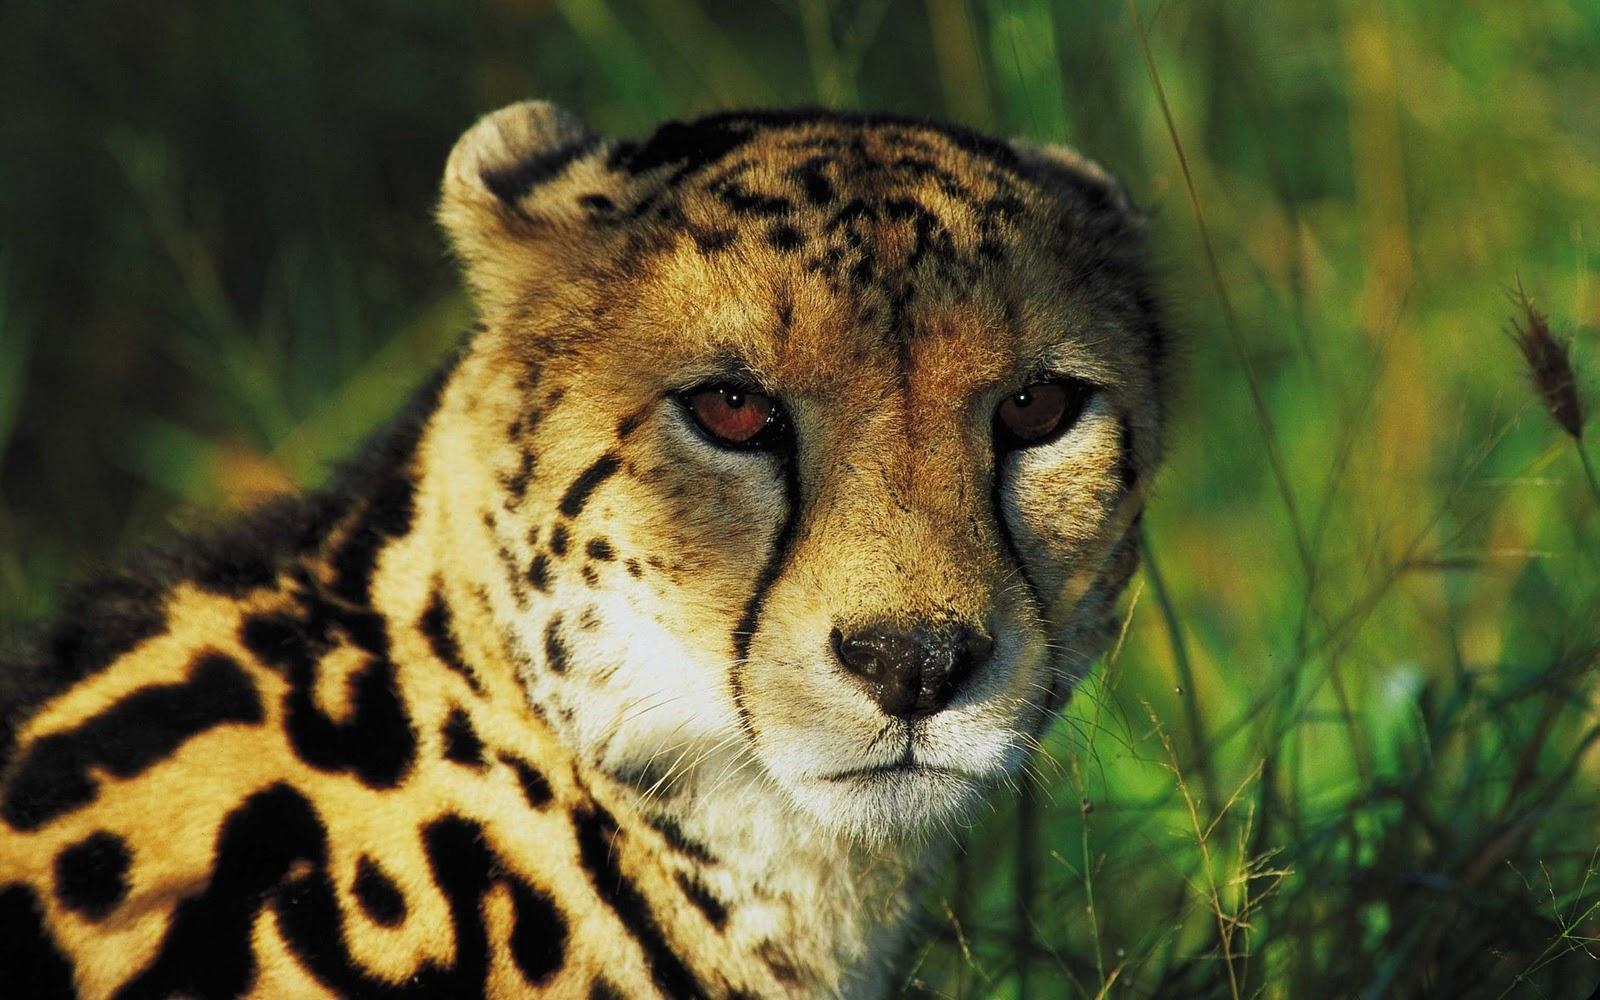 gambar macan tutul - gambar macan - gambar macan tutul